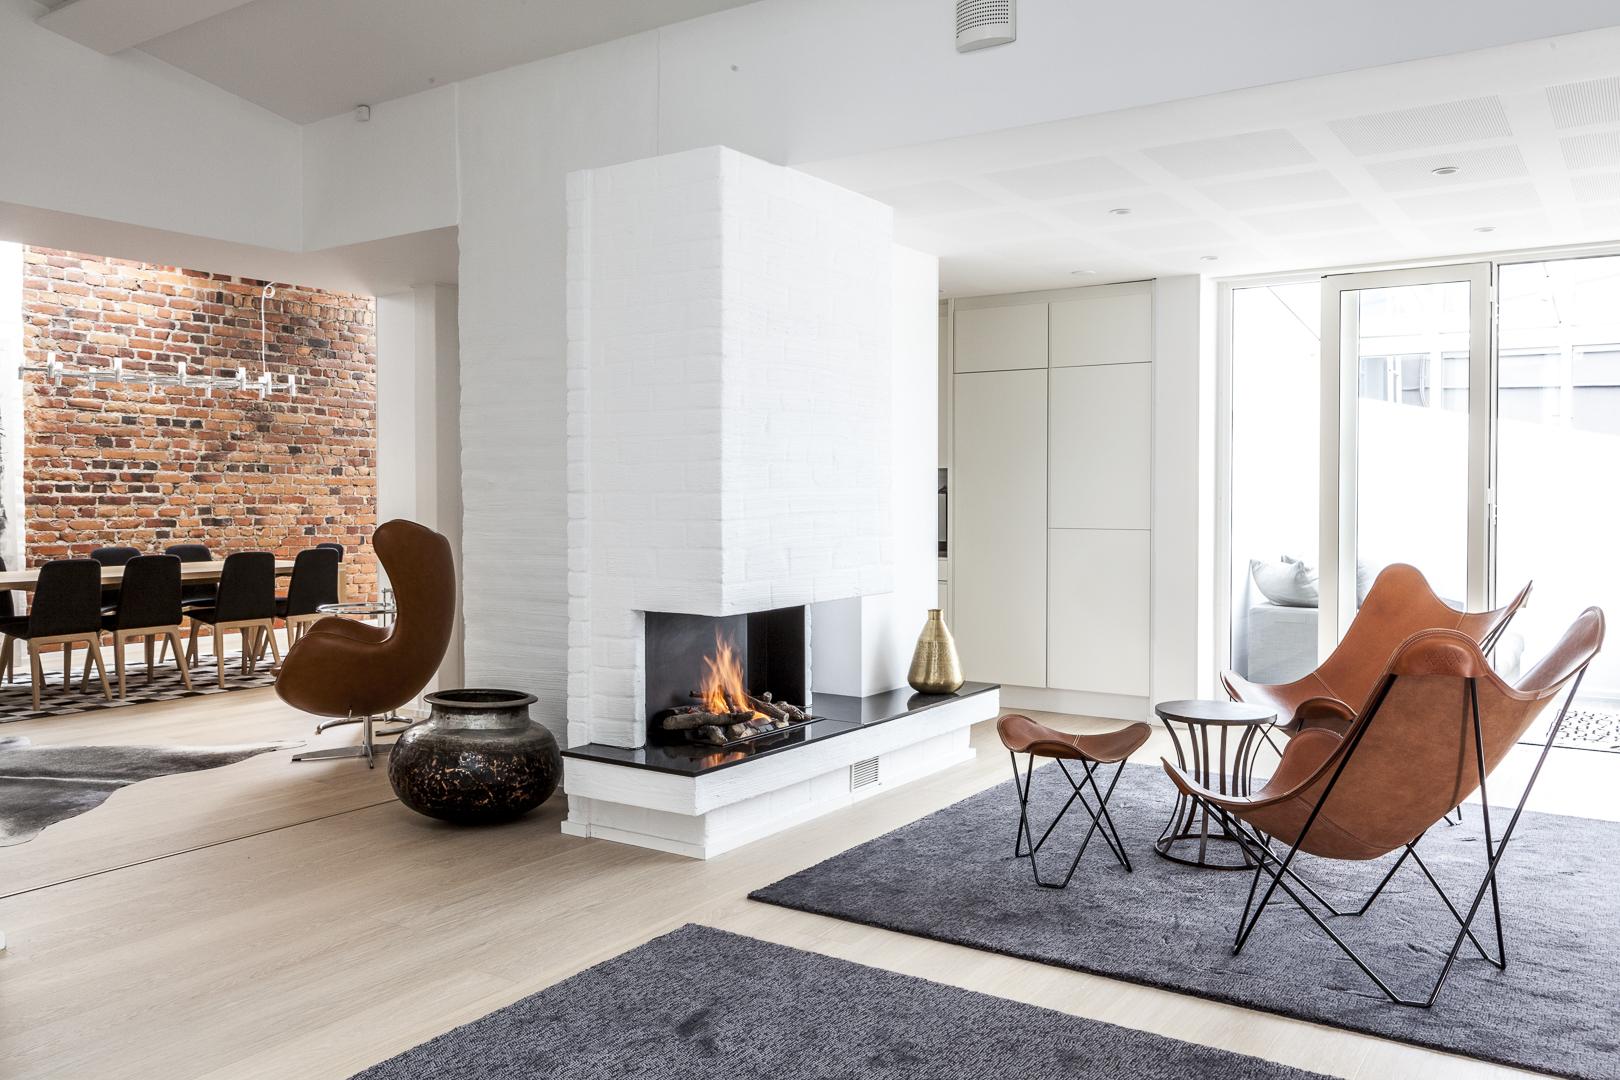 Home designed by Heini Lehto